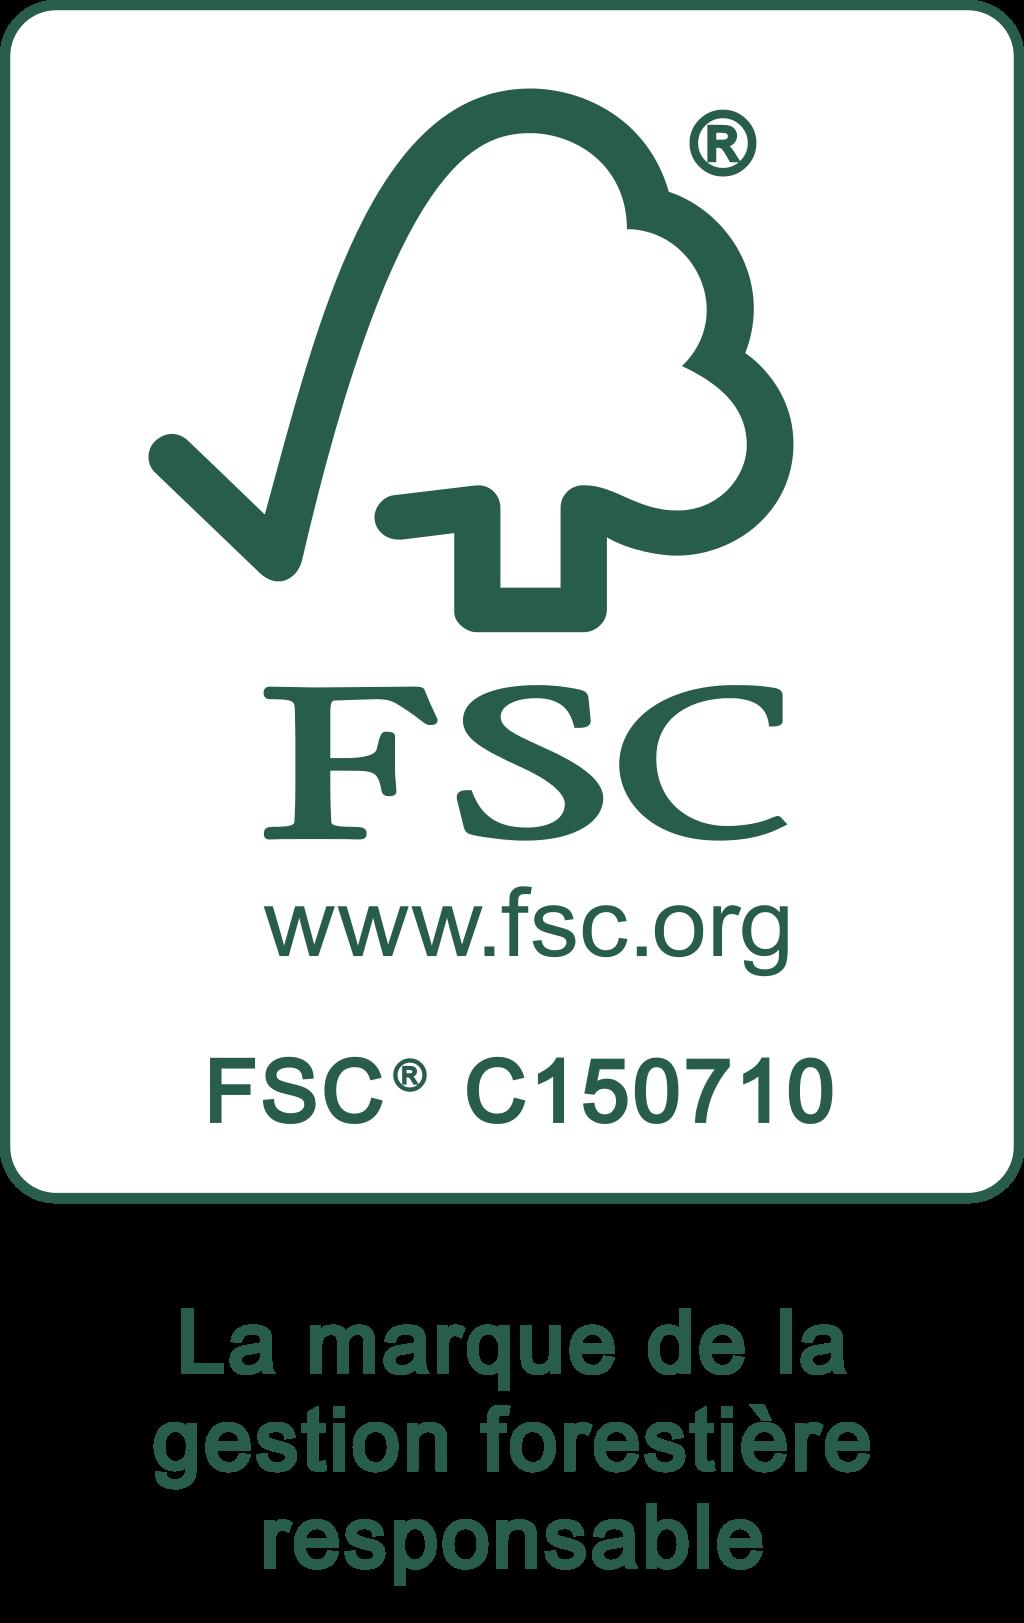 FSC_C150710_Promotional_with_text_Portrait_GreenOnWhite_r_7gCAG6.png